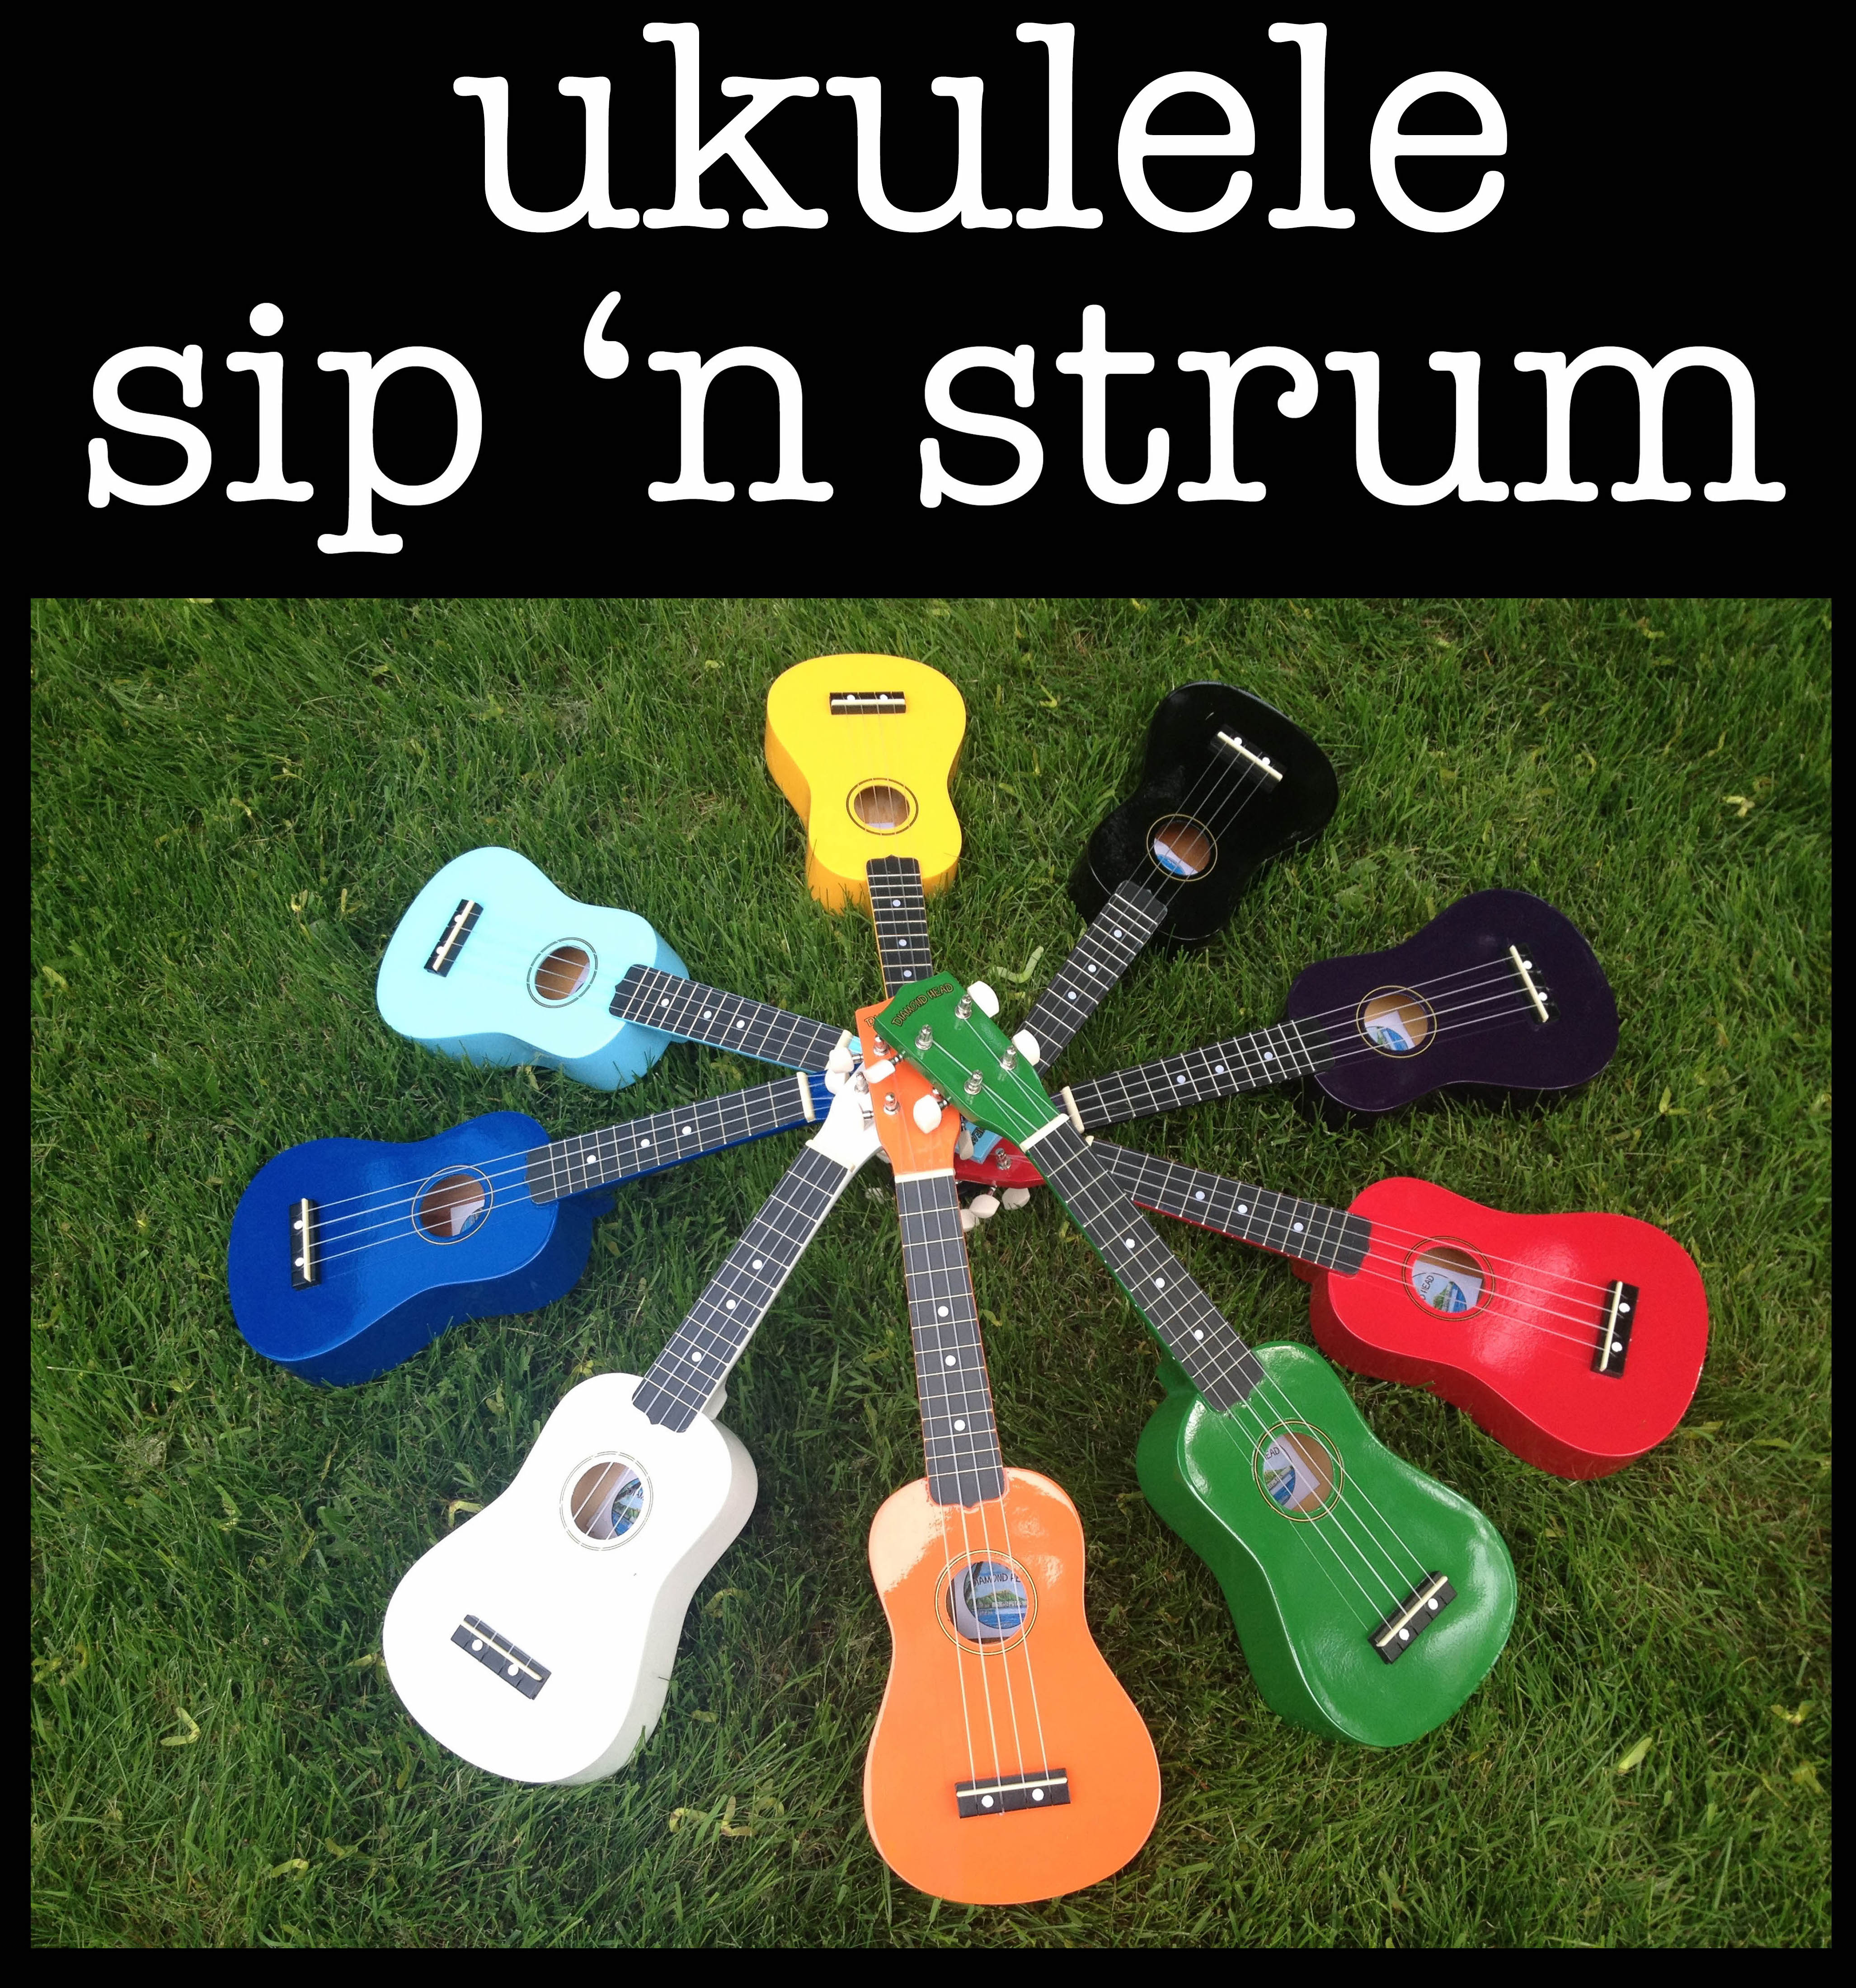 generic ukulele sip n strum (no date) copy